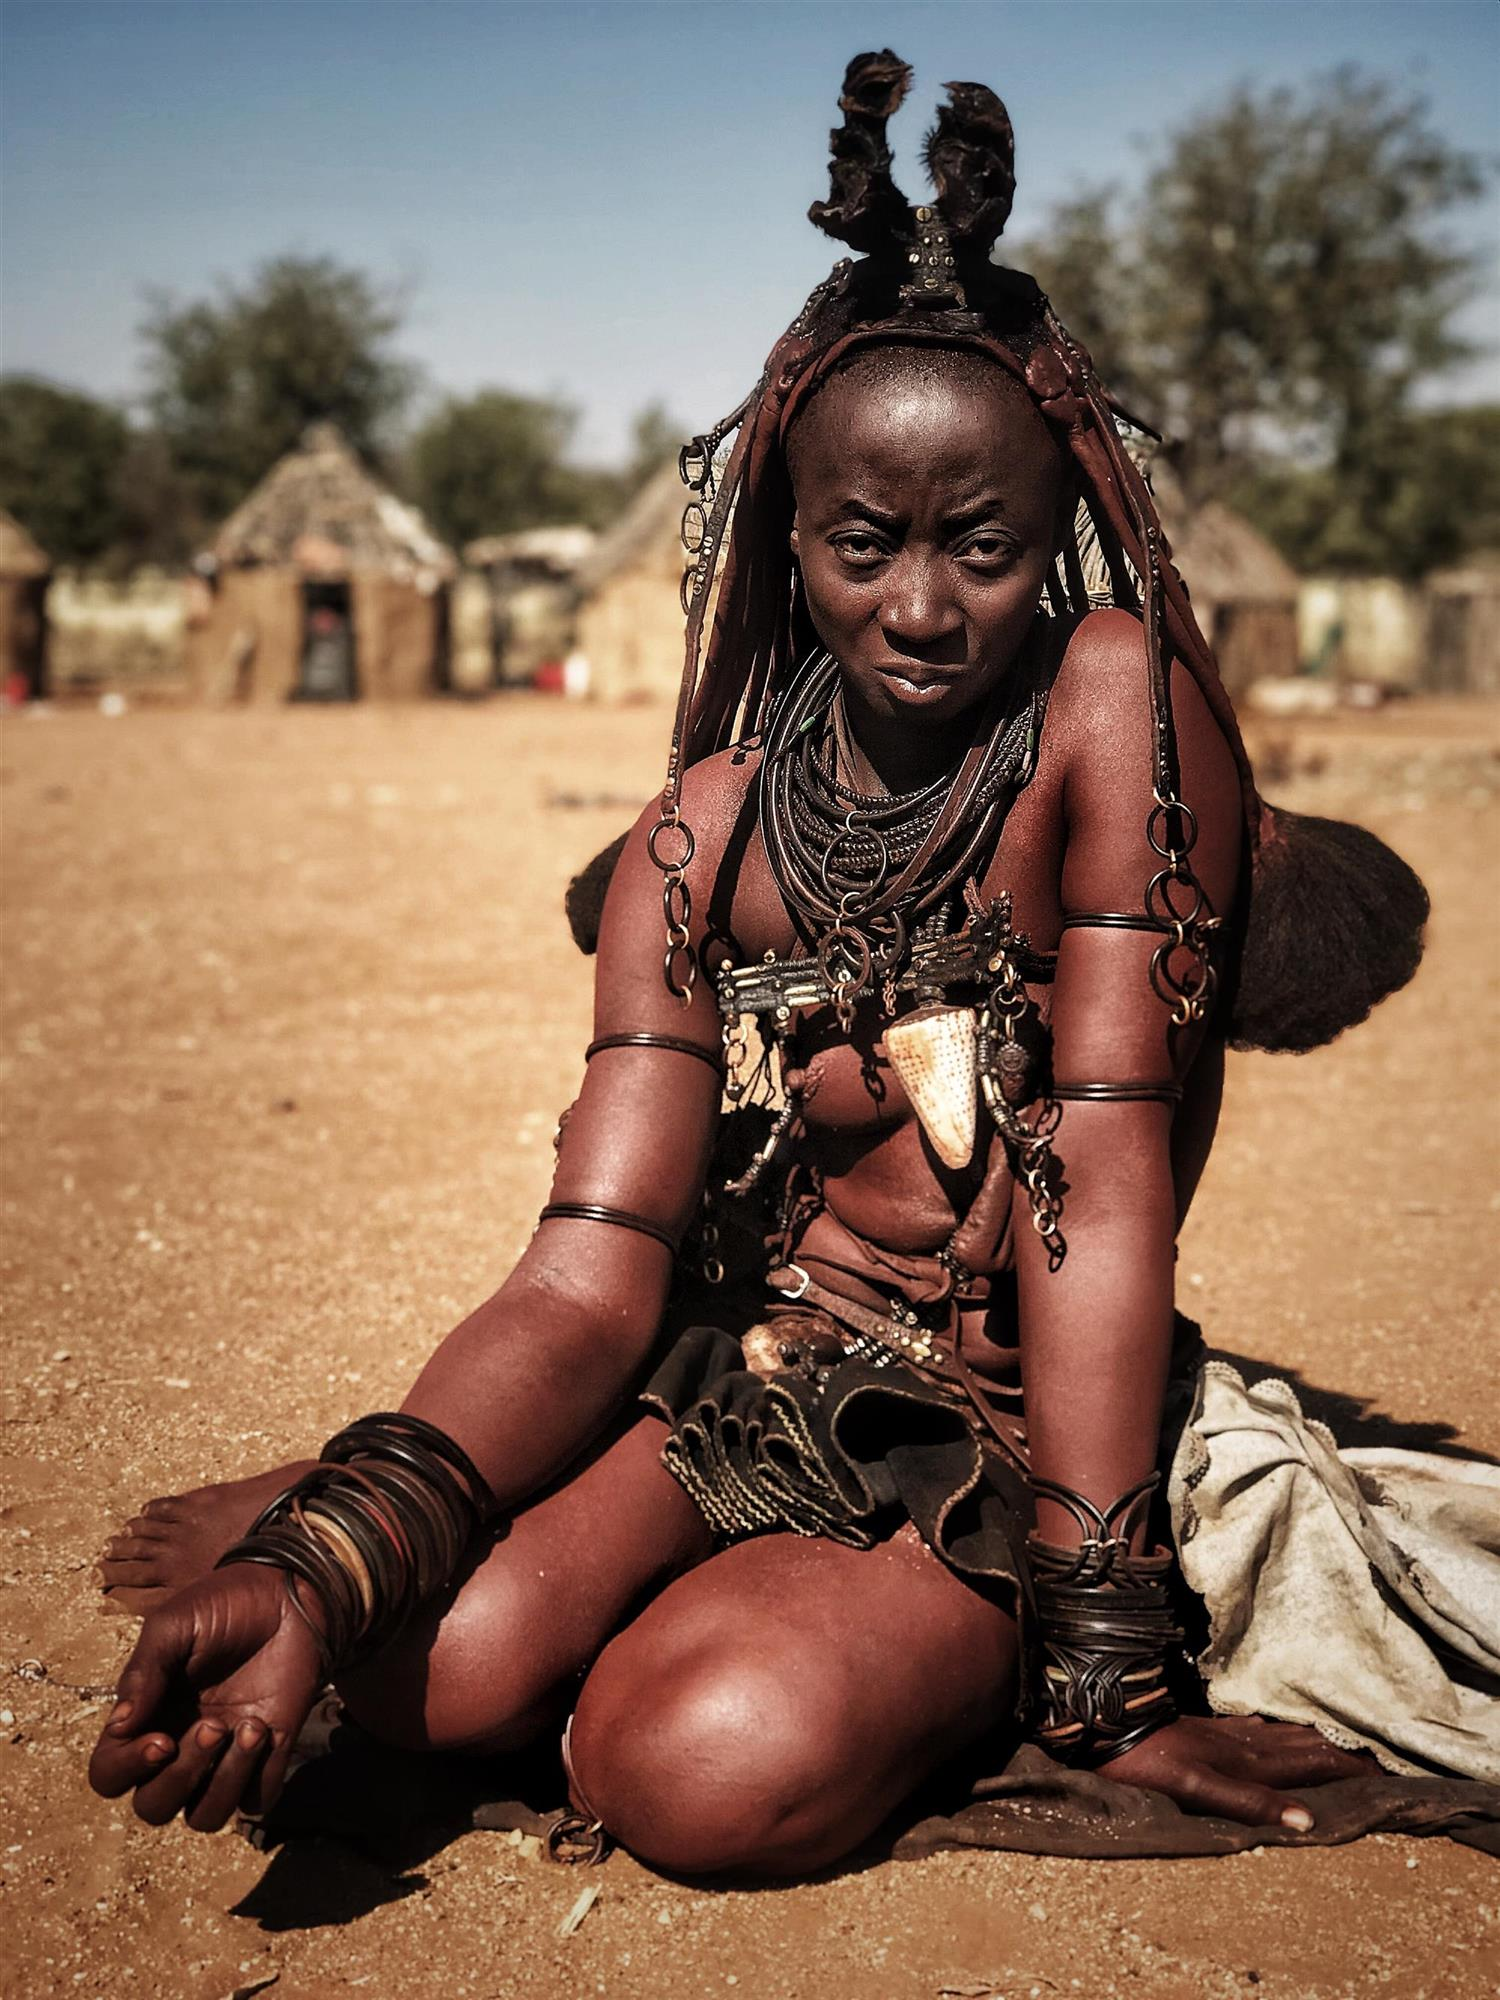 Woman in Namibia mejores fotos del 2018